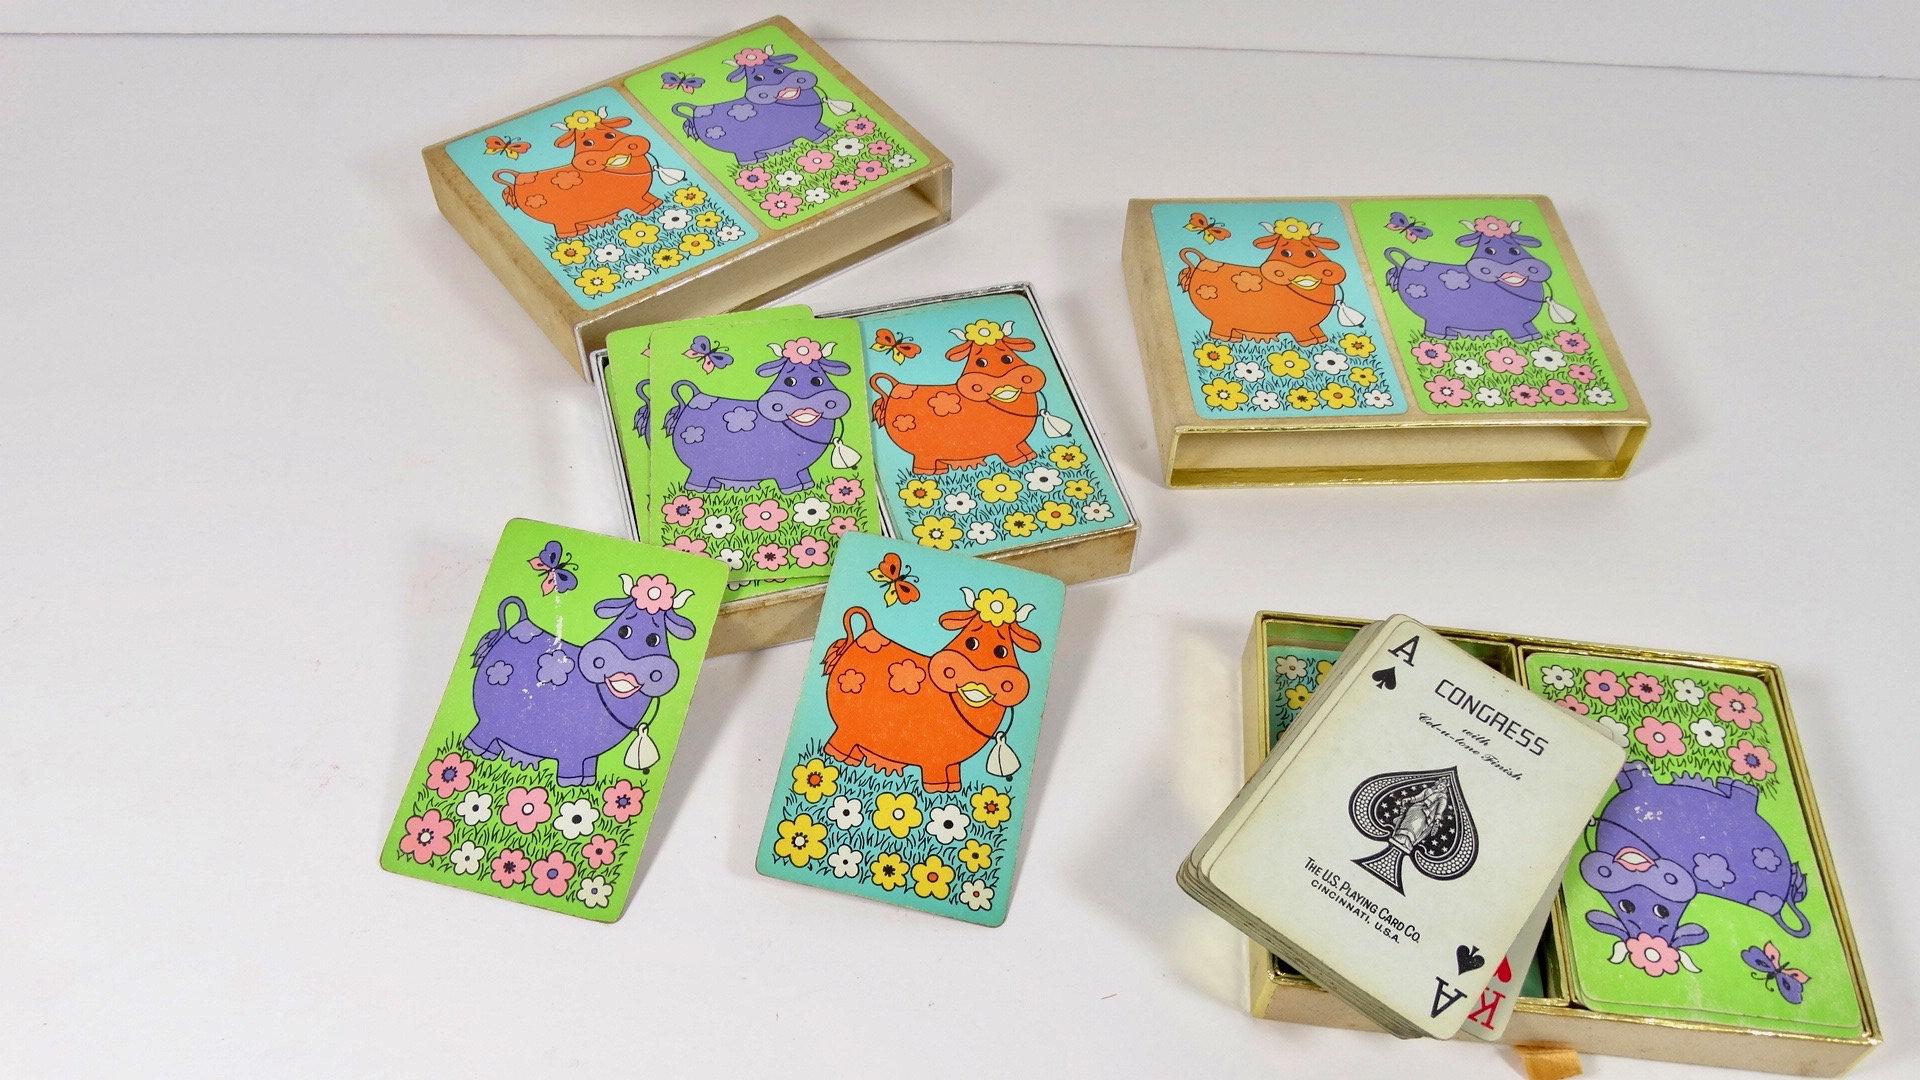 Vintage Playing Cards Congress Cel U Tone Bridge Deck Double Deck Midcentury Cow Kitsh Cards